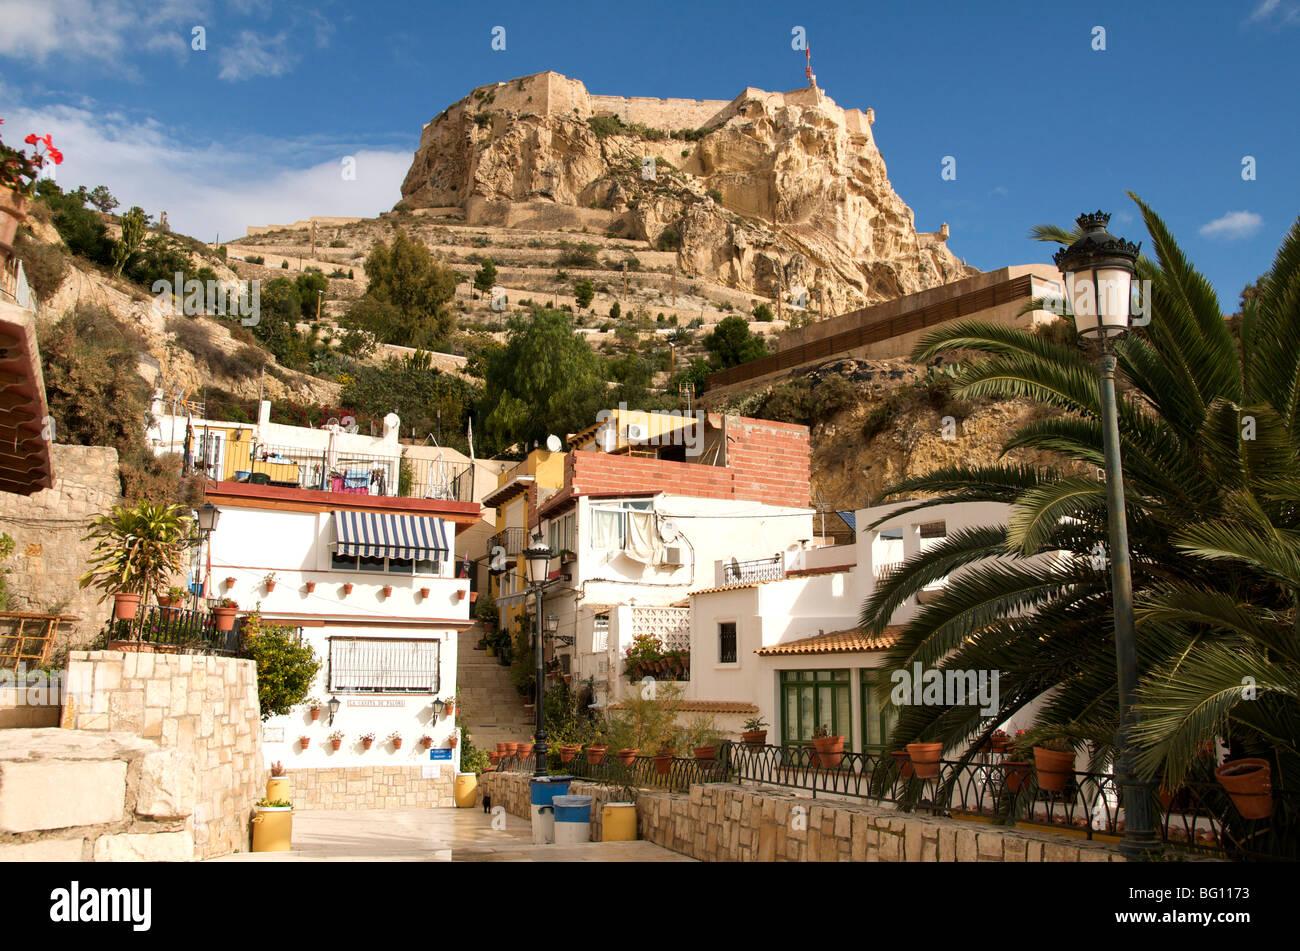 Casco Antiguo, Santa Cruz quarter and Santa Barbara castle in background, Alicante, Valencia province, Spain, Europe - Stock Image